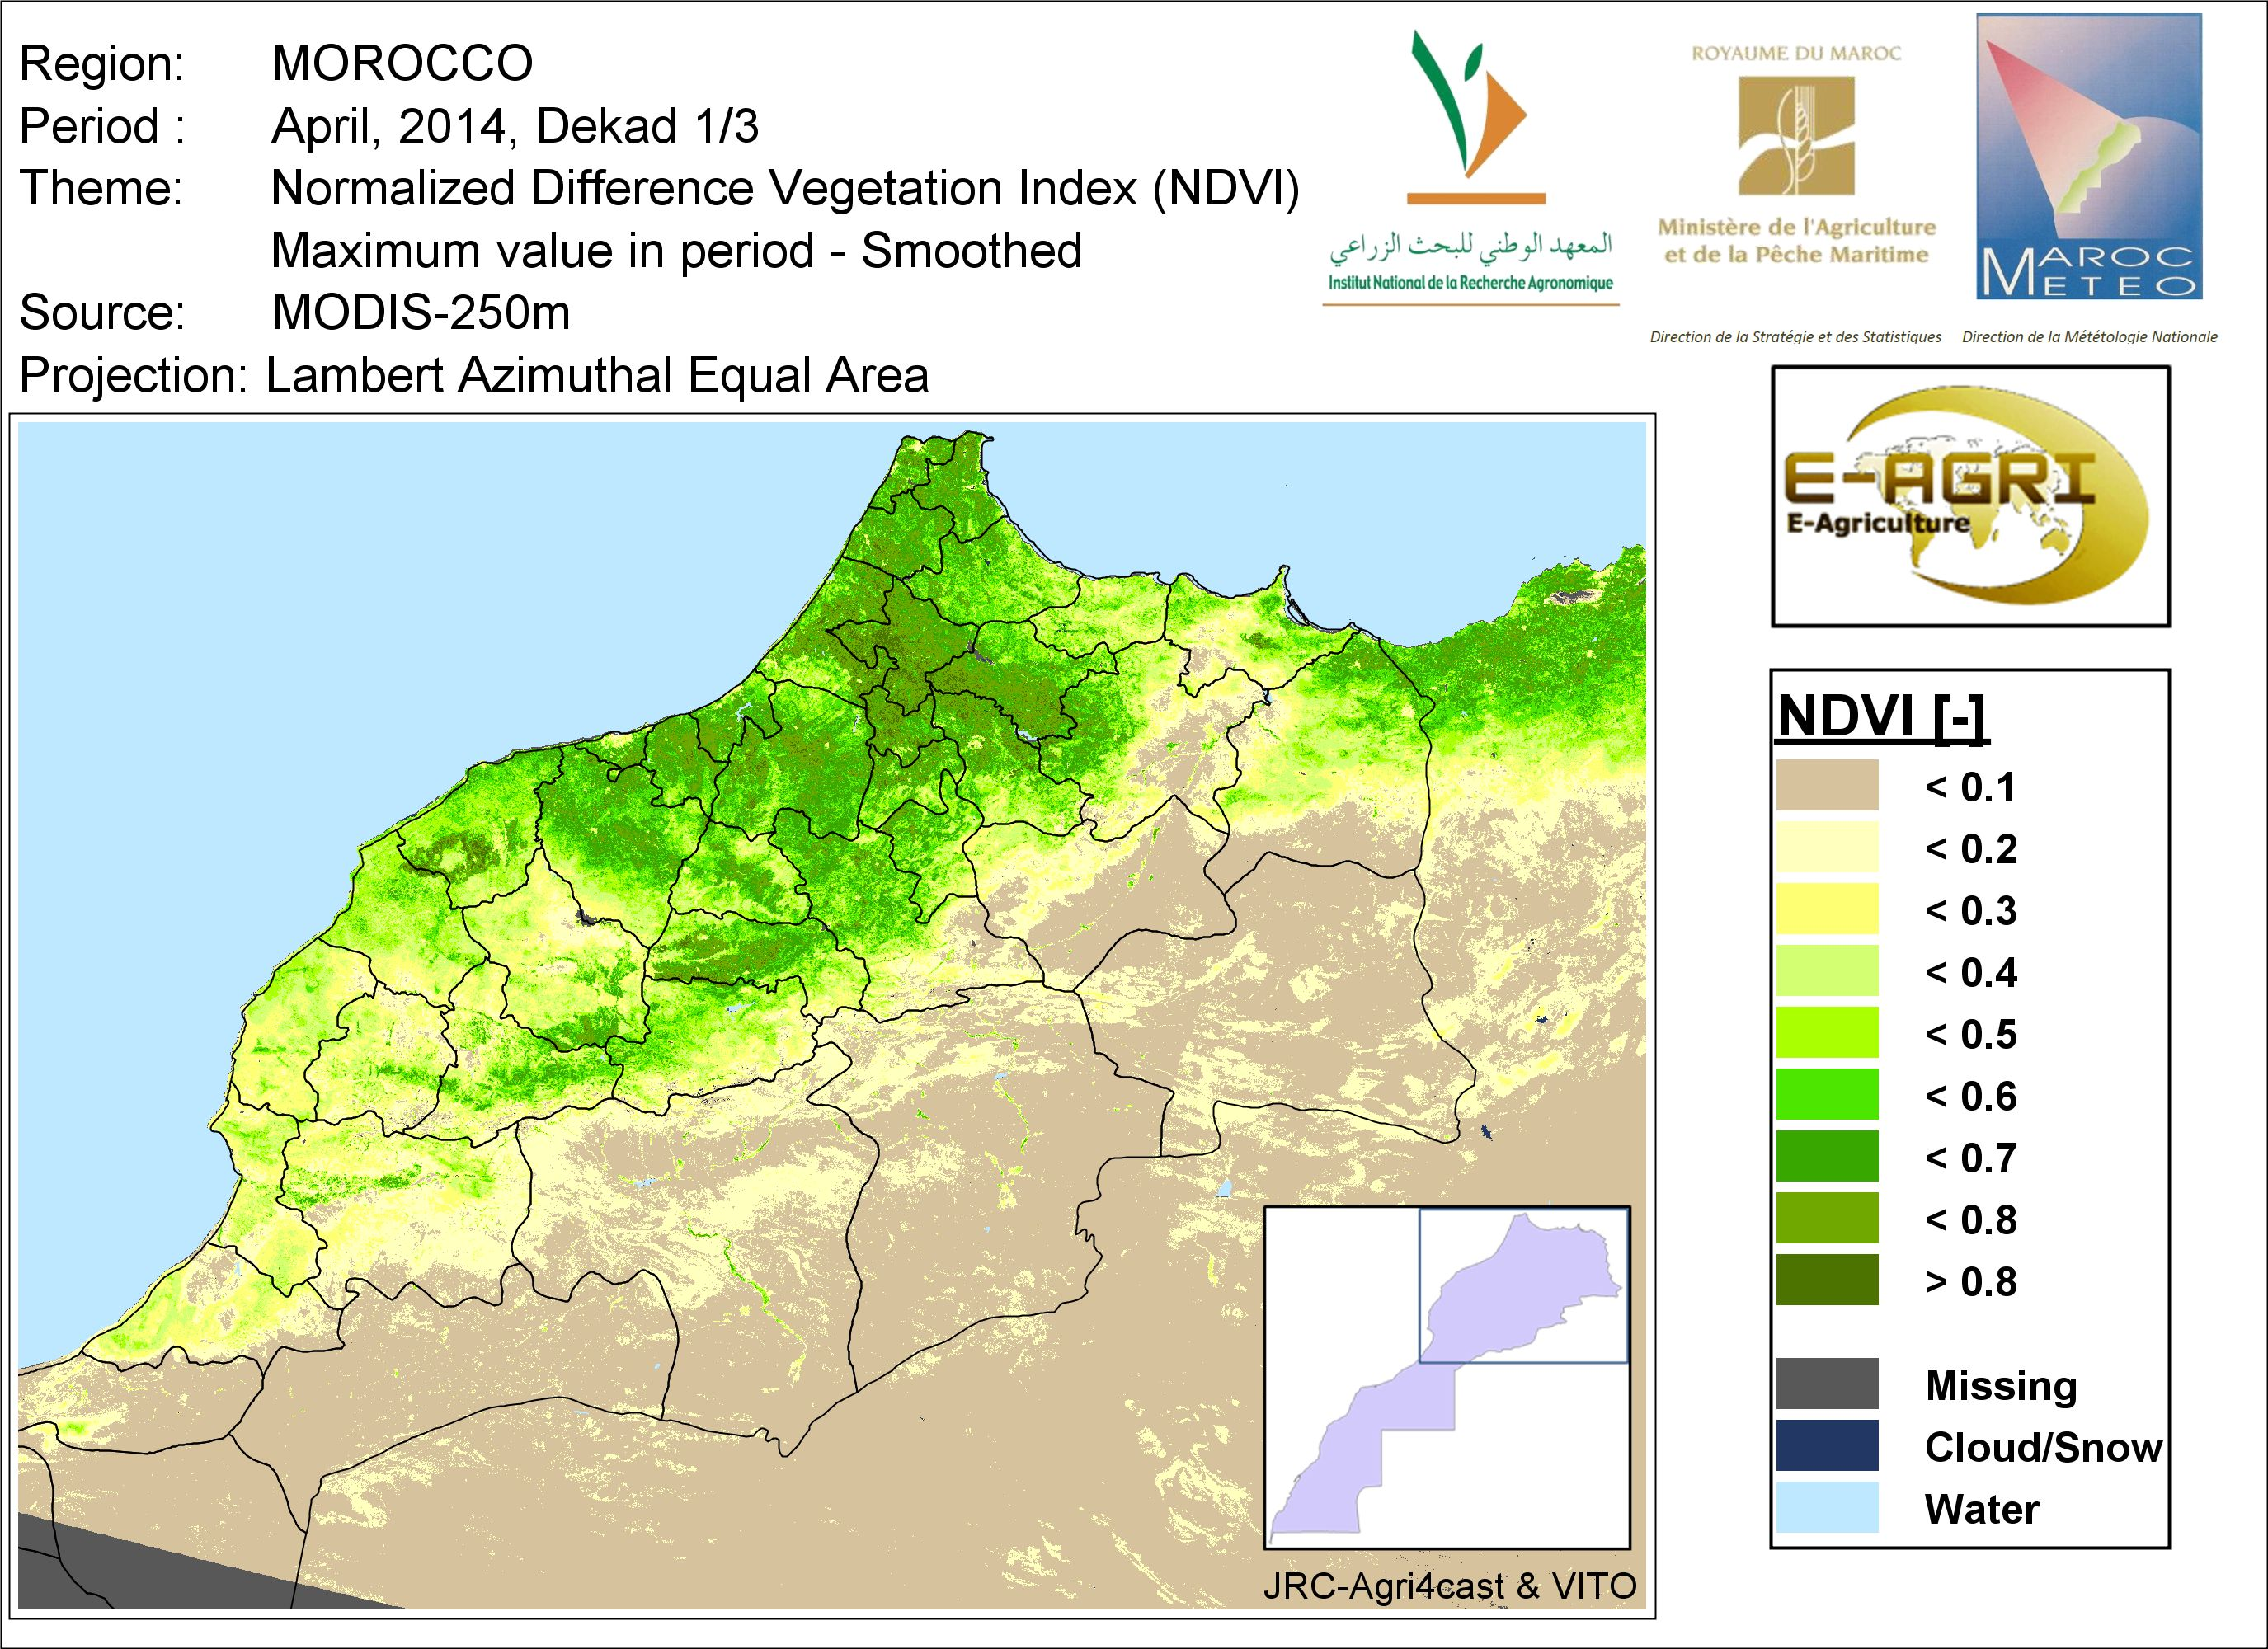 http://www.cgms-maroc.ma/images/ndvi010414.jpg